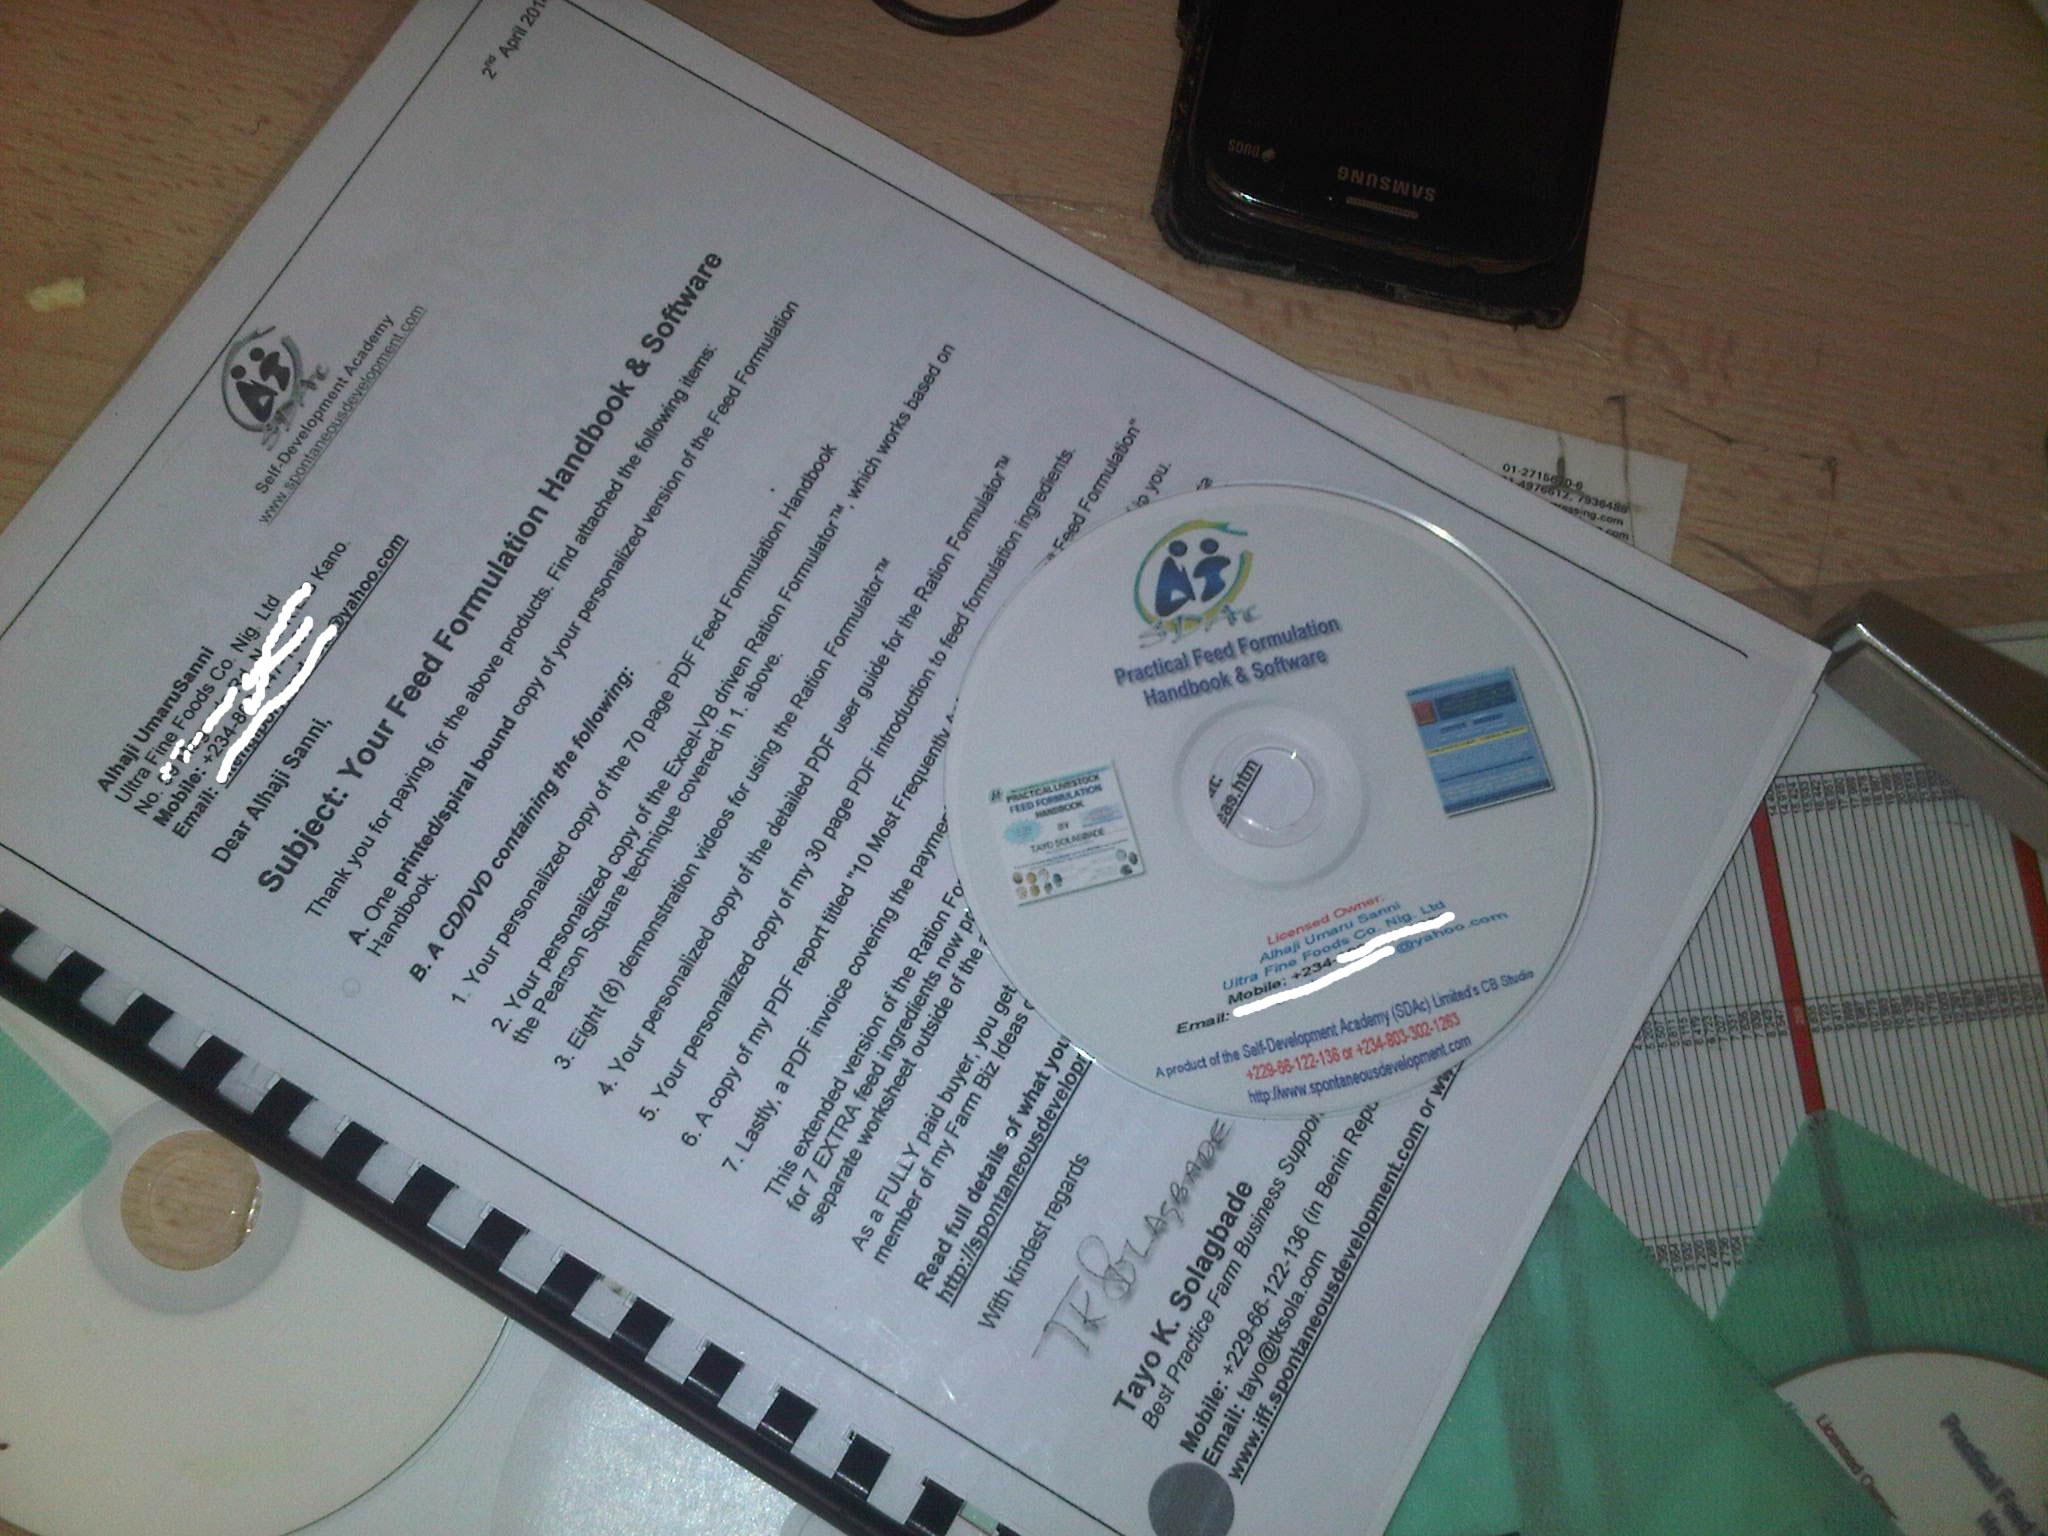 My Feed Formulation Handbook hard copy & Ration Formulator software DVD